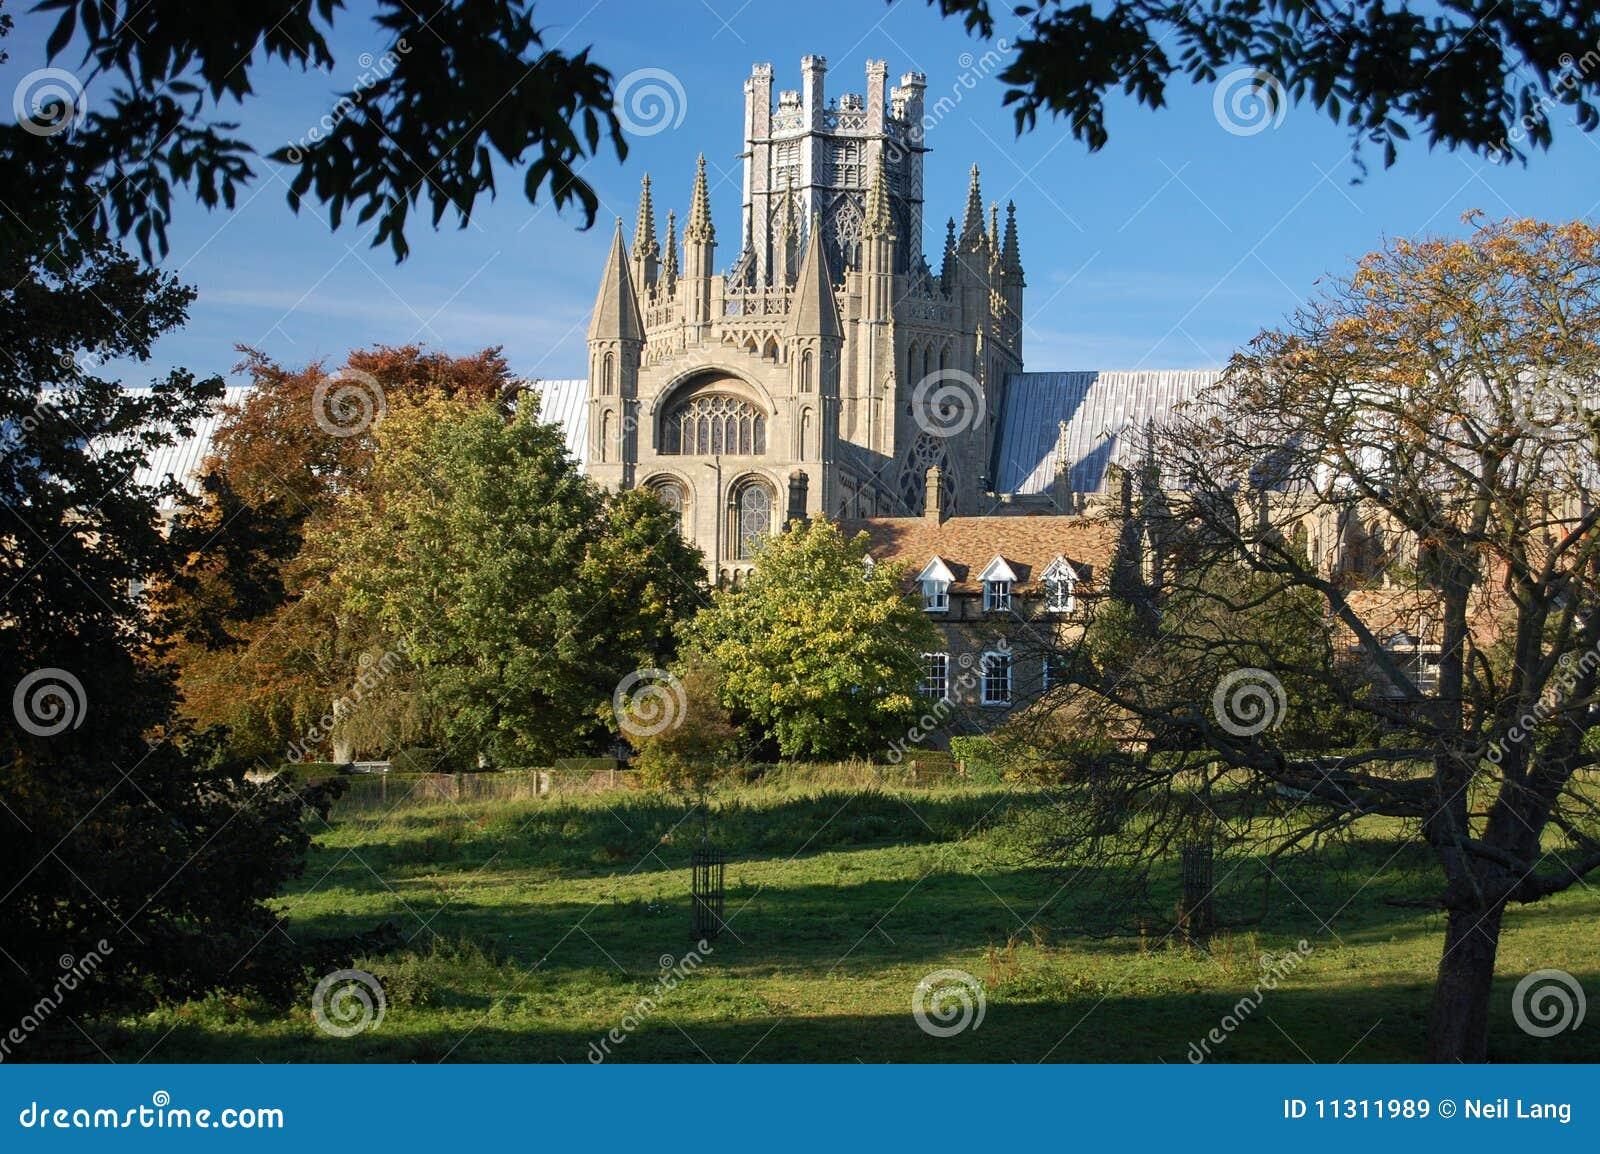 Cattedrale di Ely, Cambridgeshire, Inghilterra